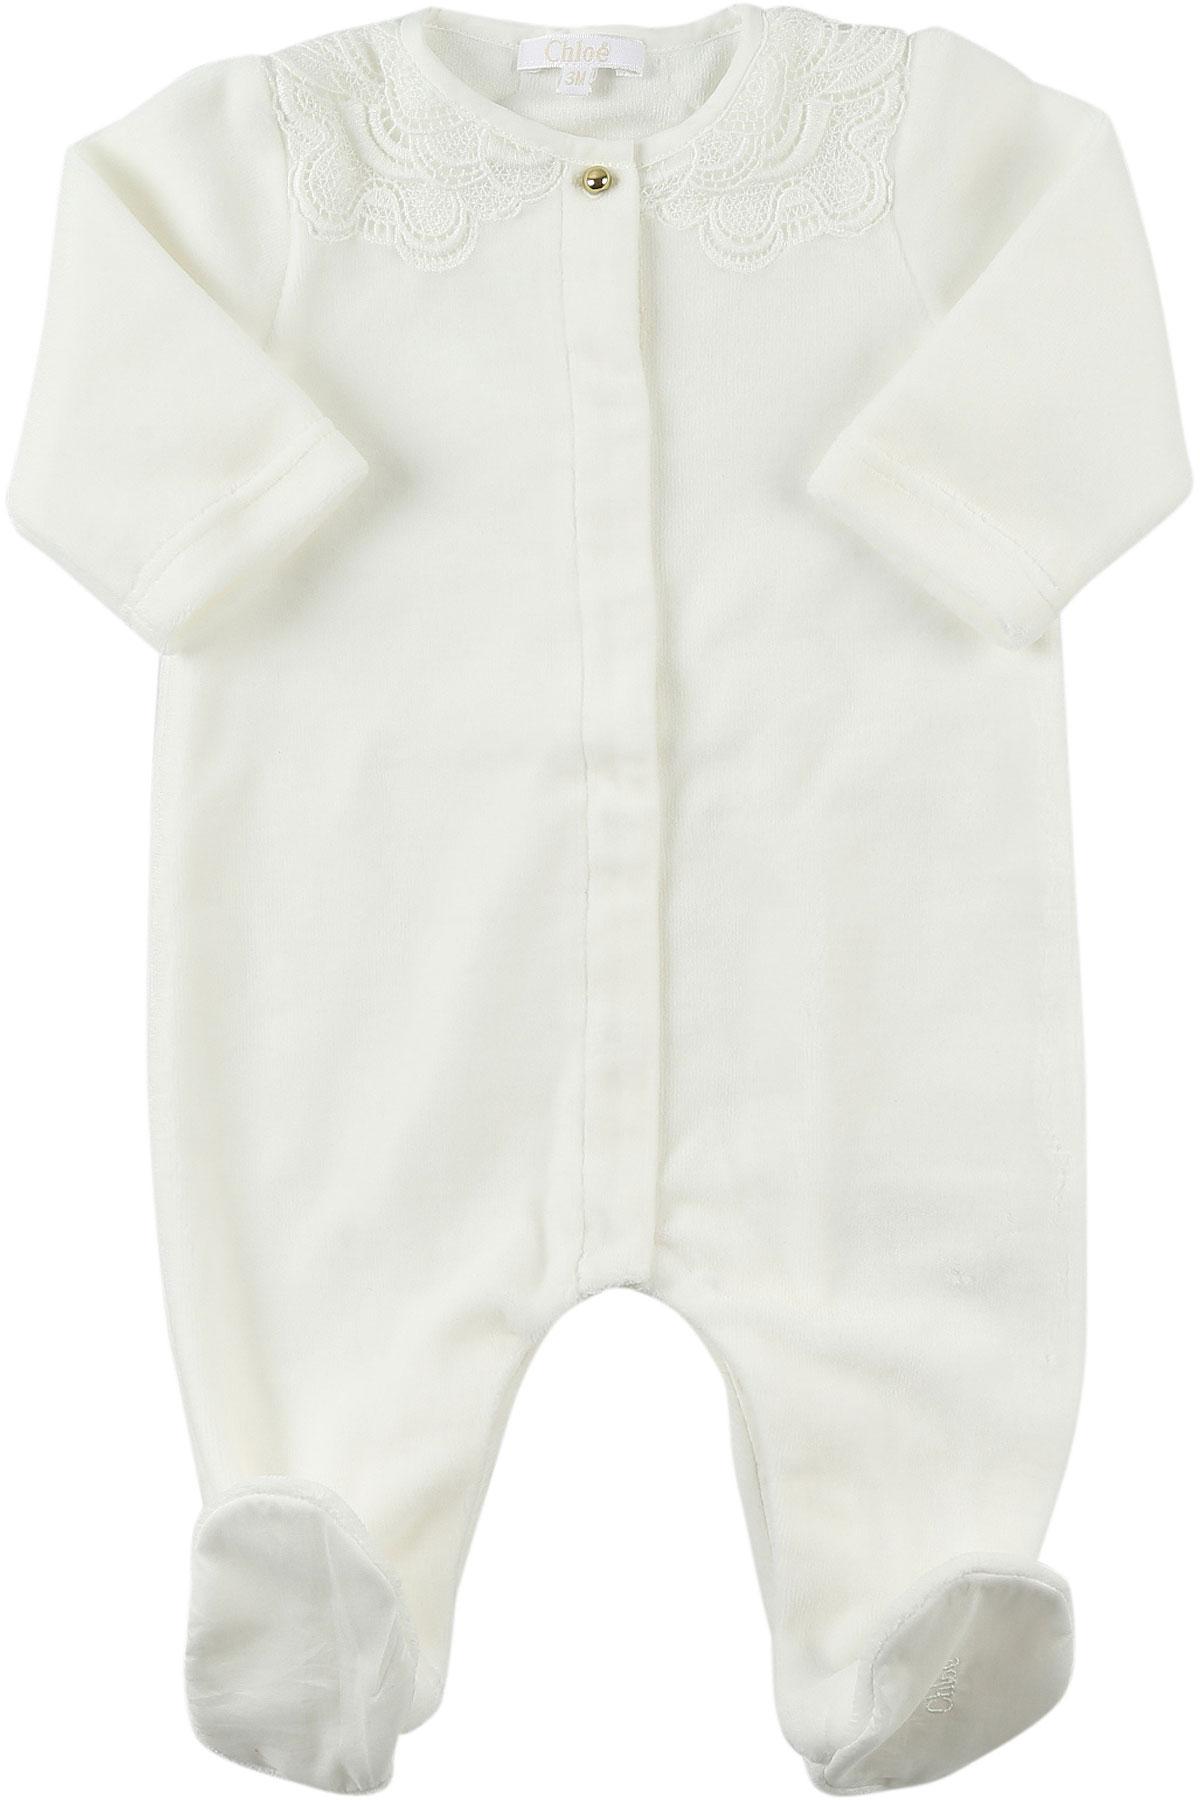 Image of Chloe Baby Bodysuits & Onesies for Girls, White, Cott, 2017, 1M 3M